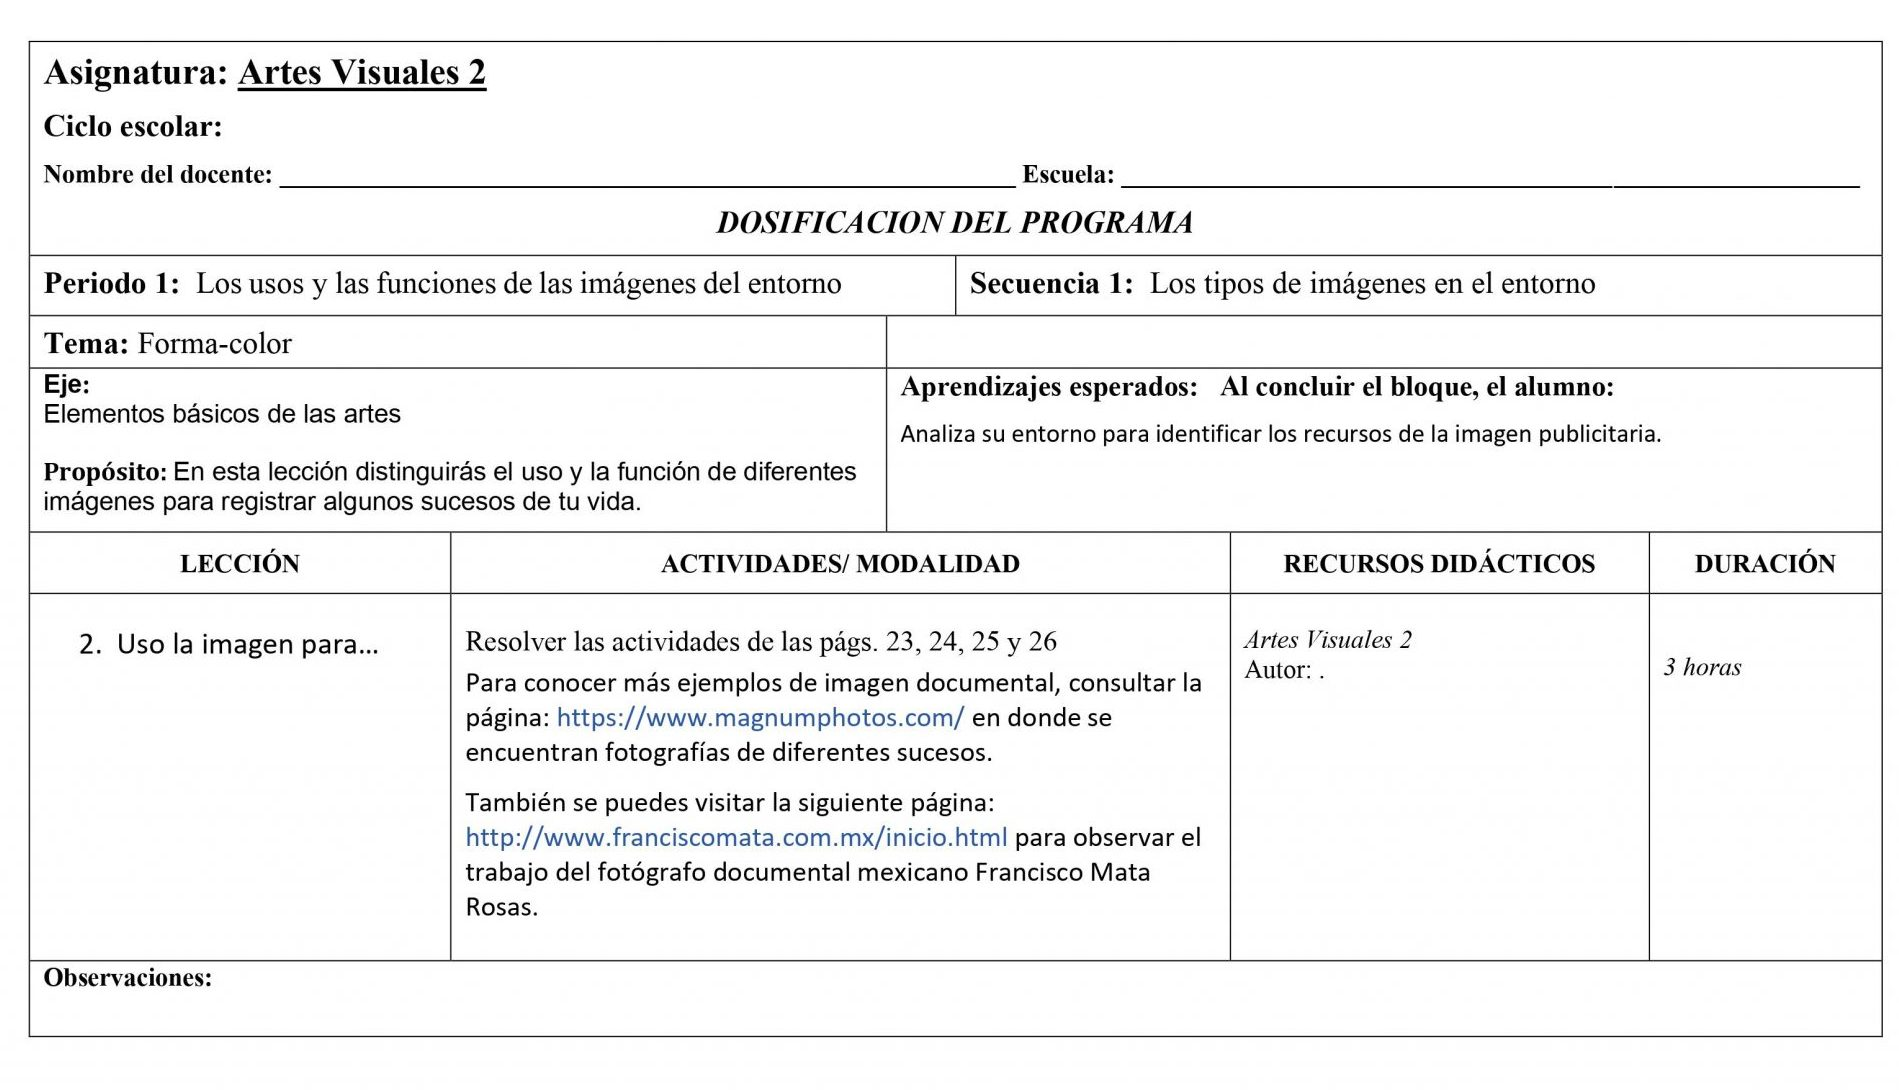 Dosificación Artes Visuales 2 Secundaria (Nuevo Modelo Educativo) 1er. Trimestre 02